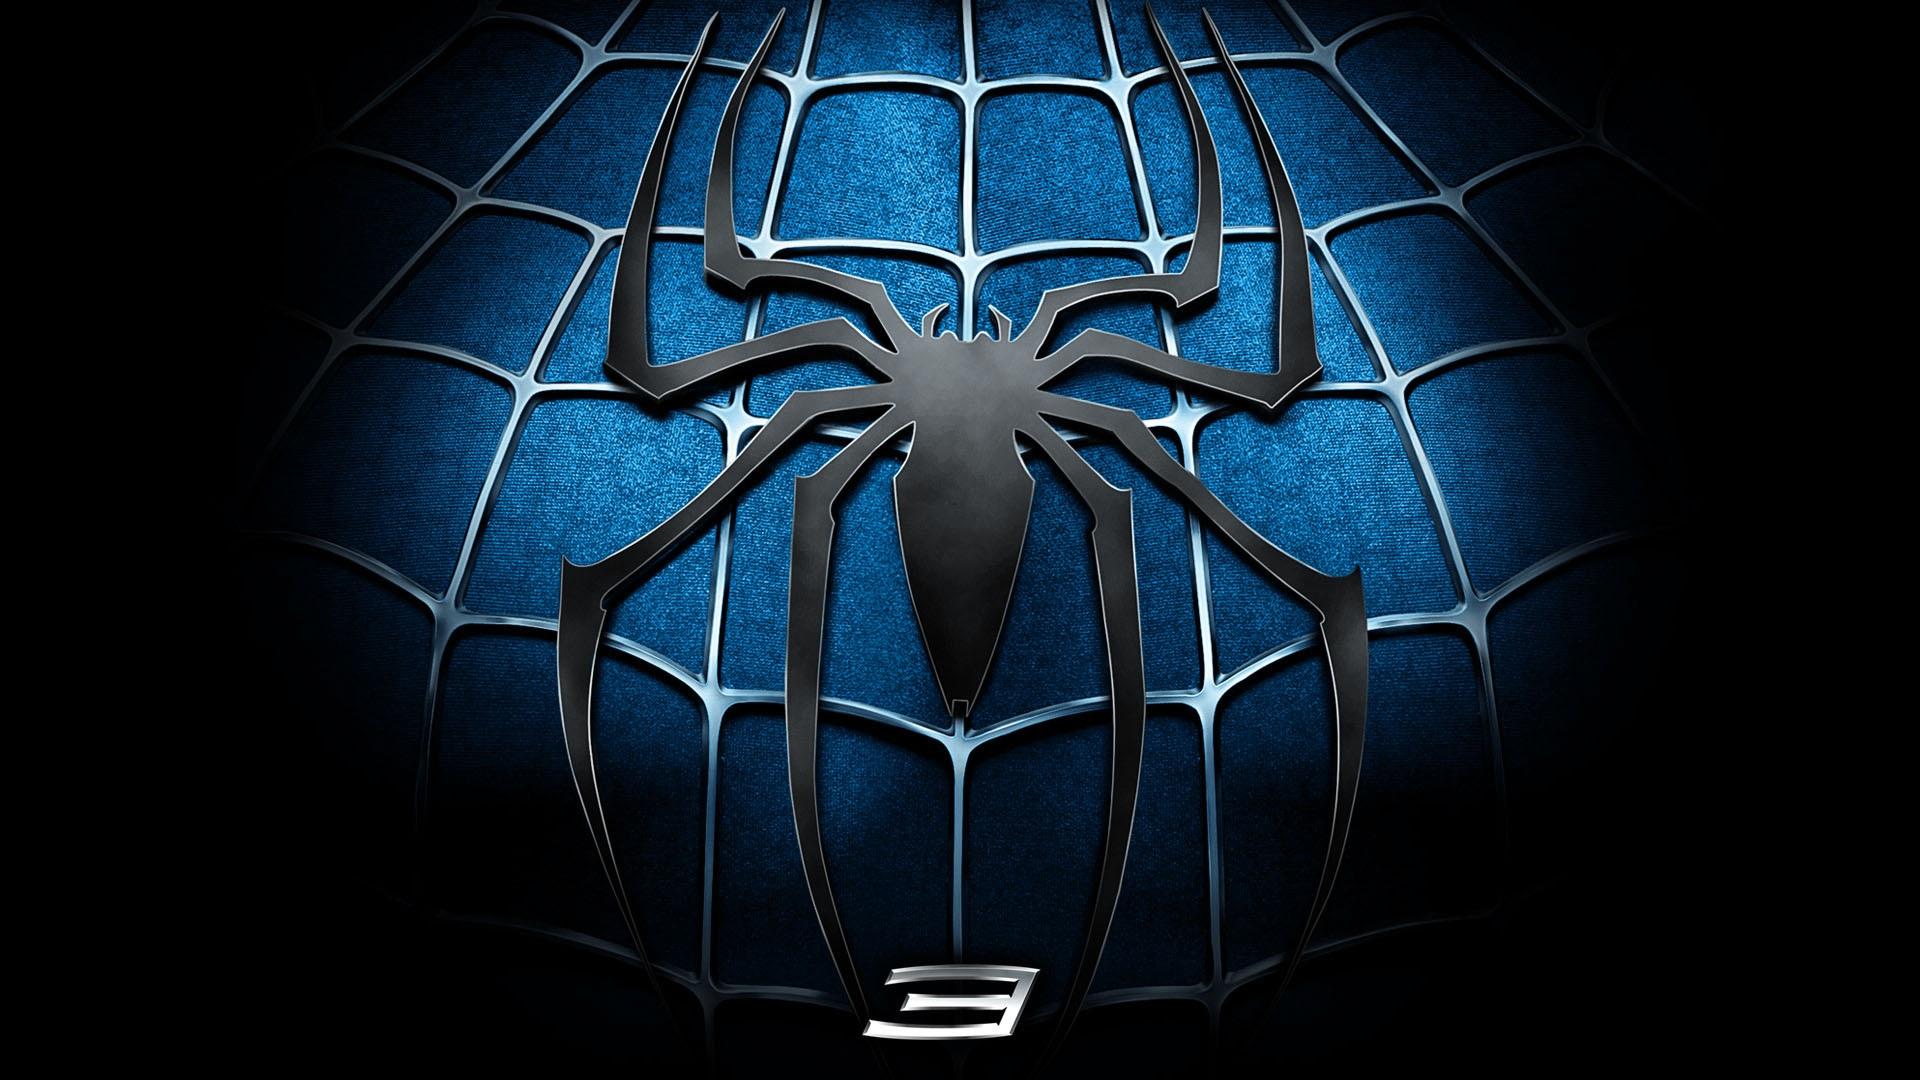 spiderman 3 logo wallpaper hd wallpaper 1920x1080